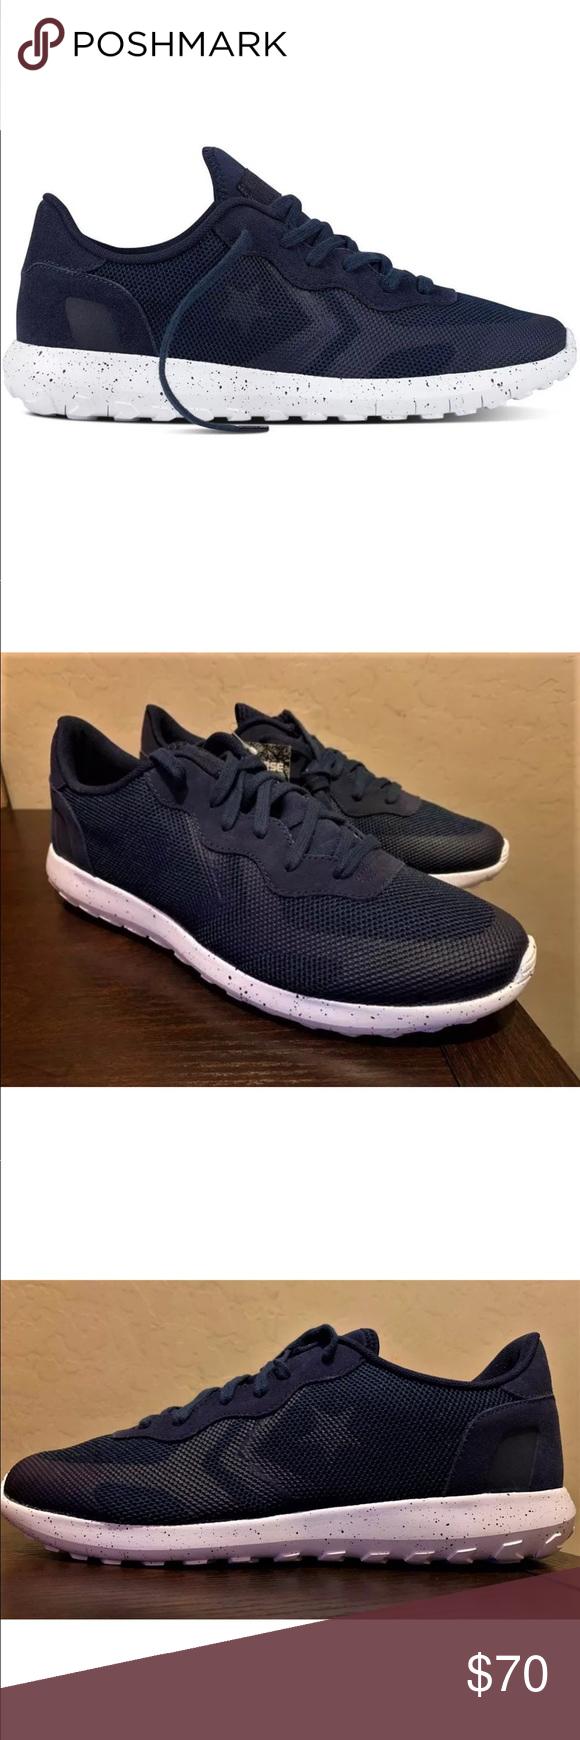 CONVERSE THUNDERBOLT ULTRA Ox Sneaker Shoes Men's size 11 $95